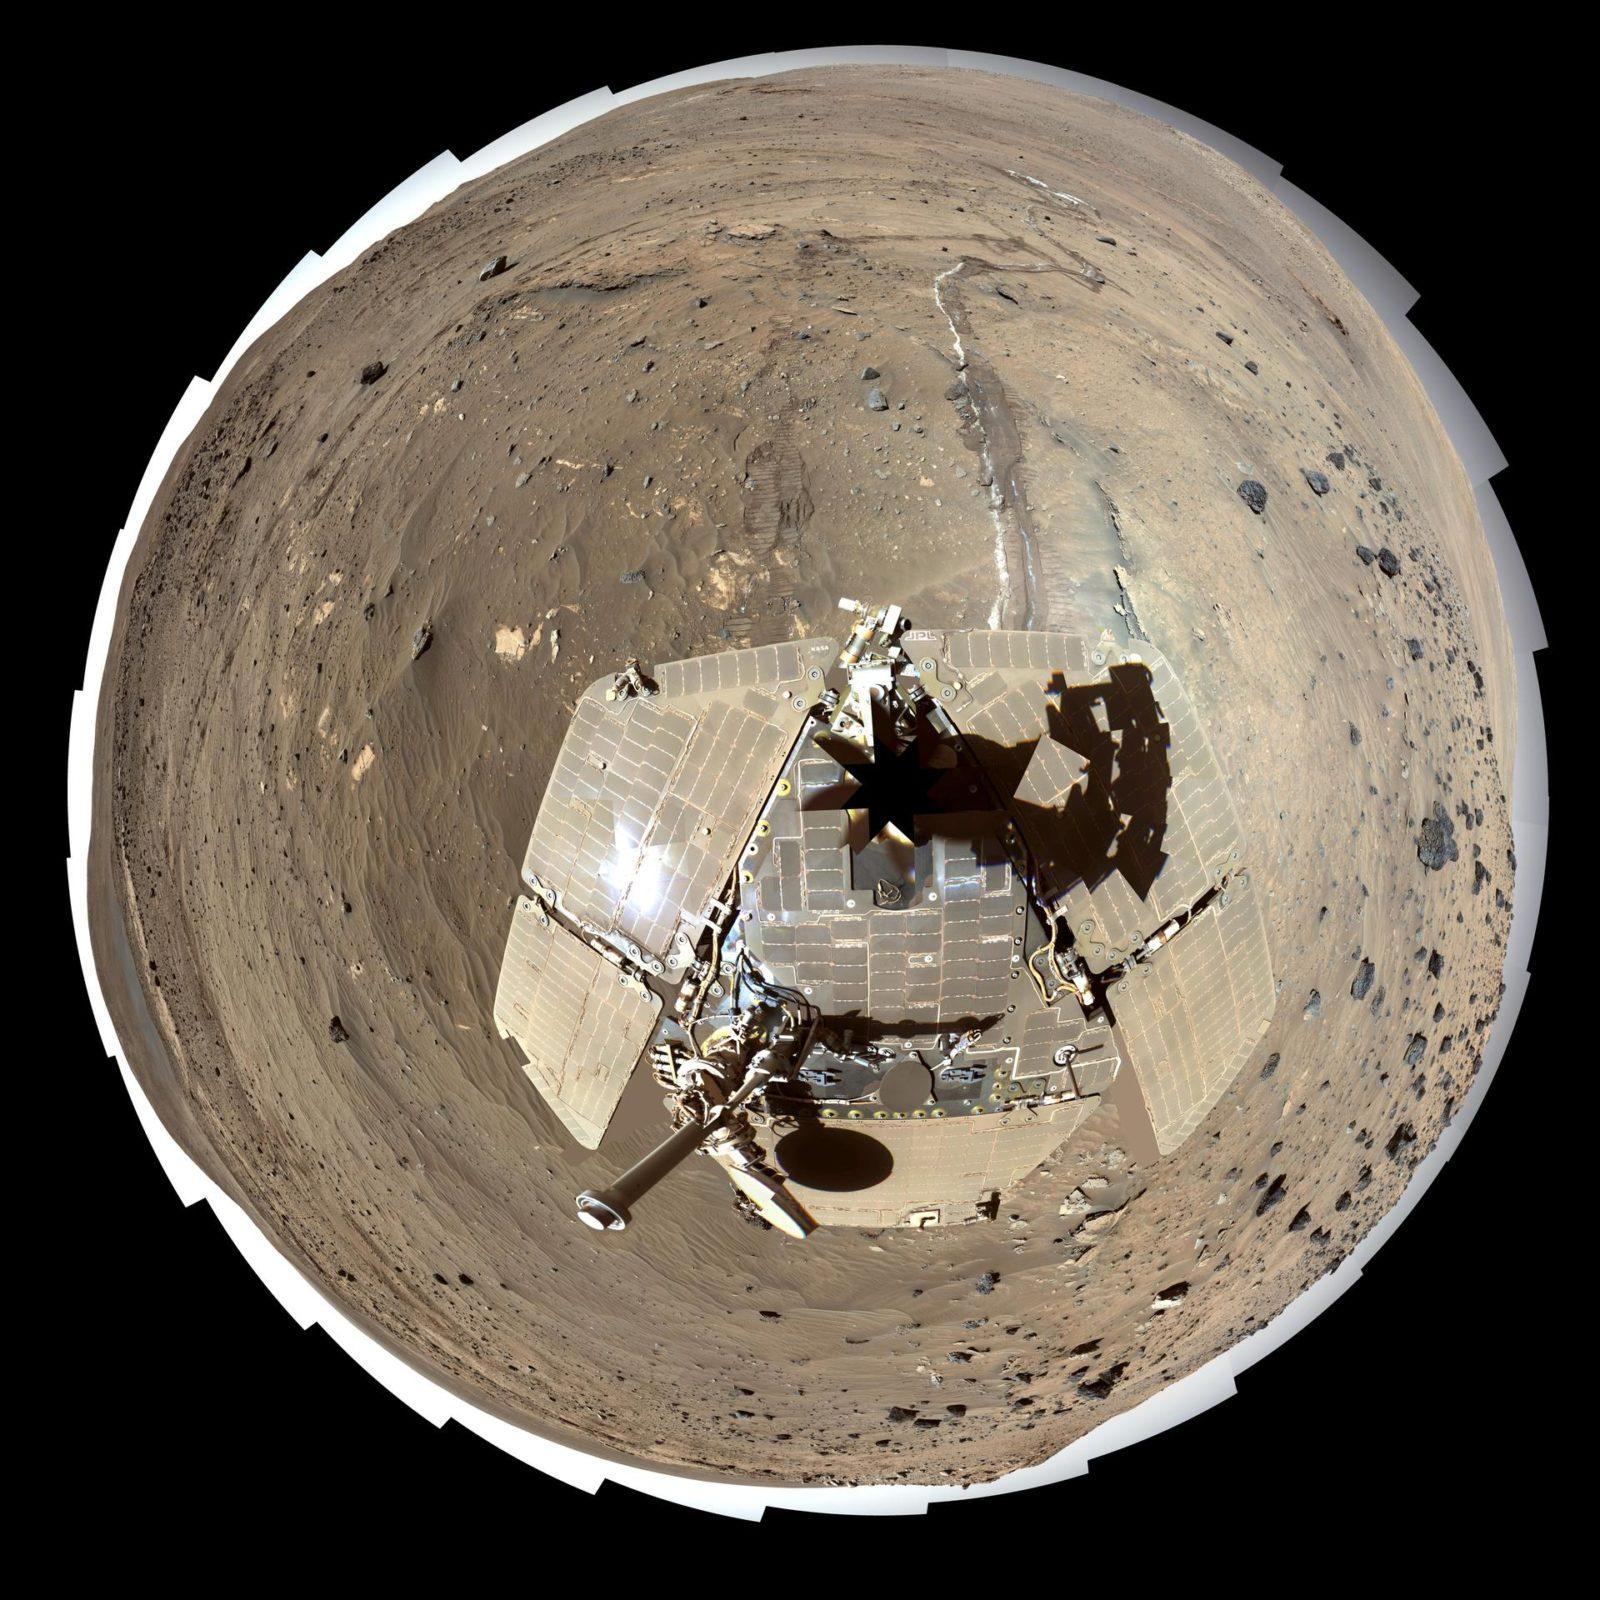 mars rover spirit - 946×710